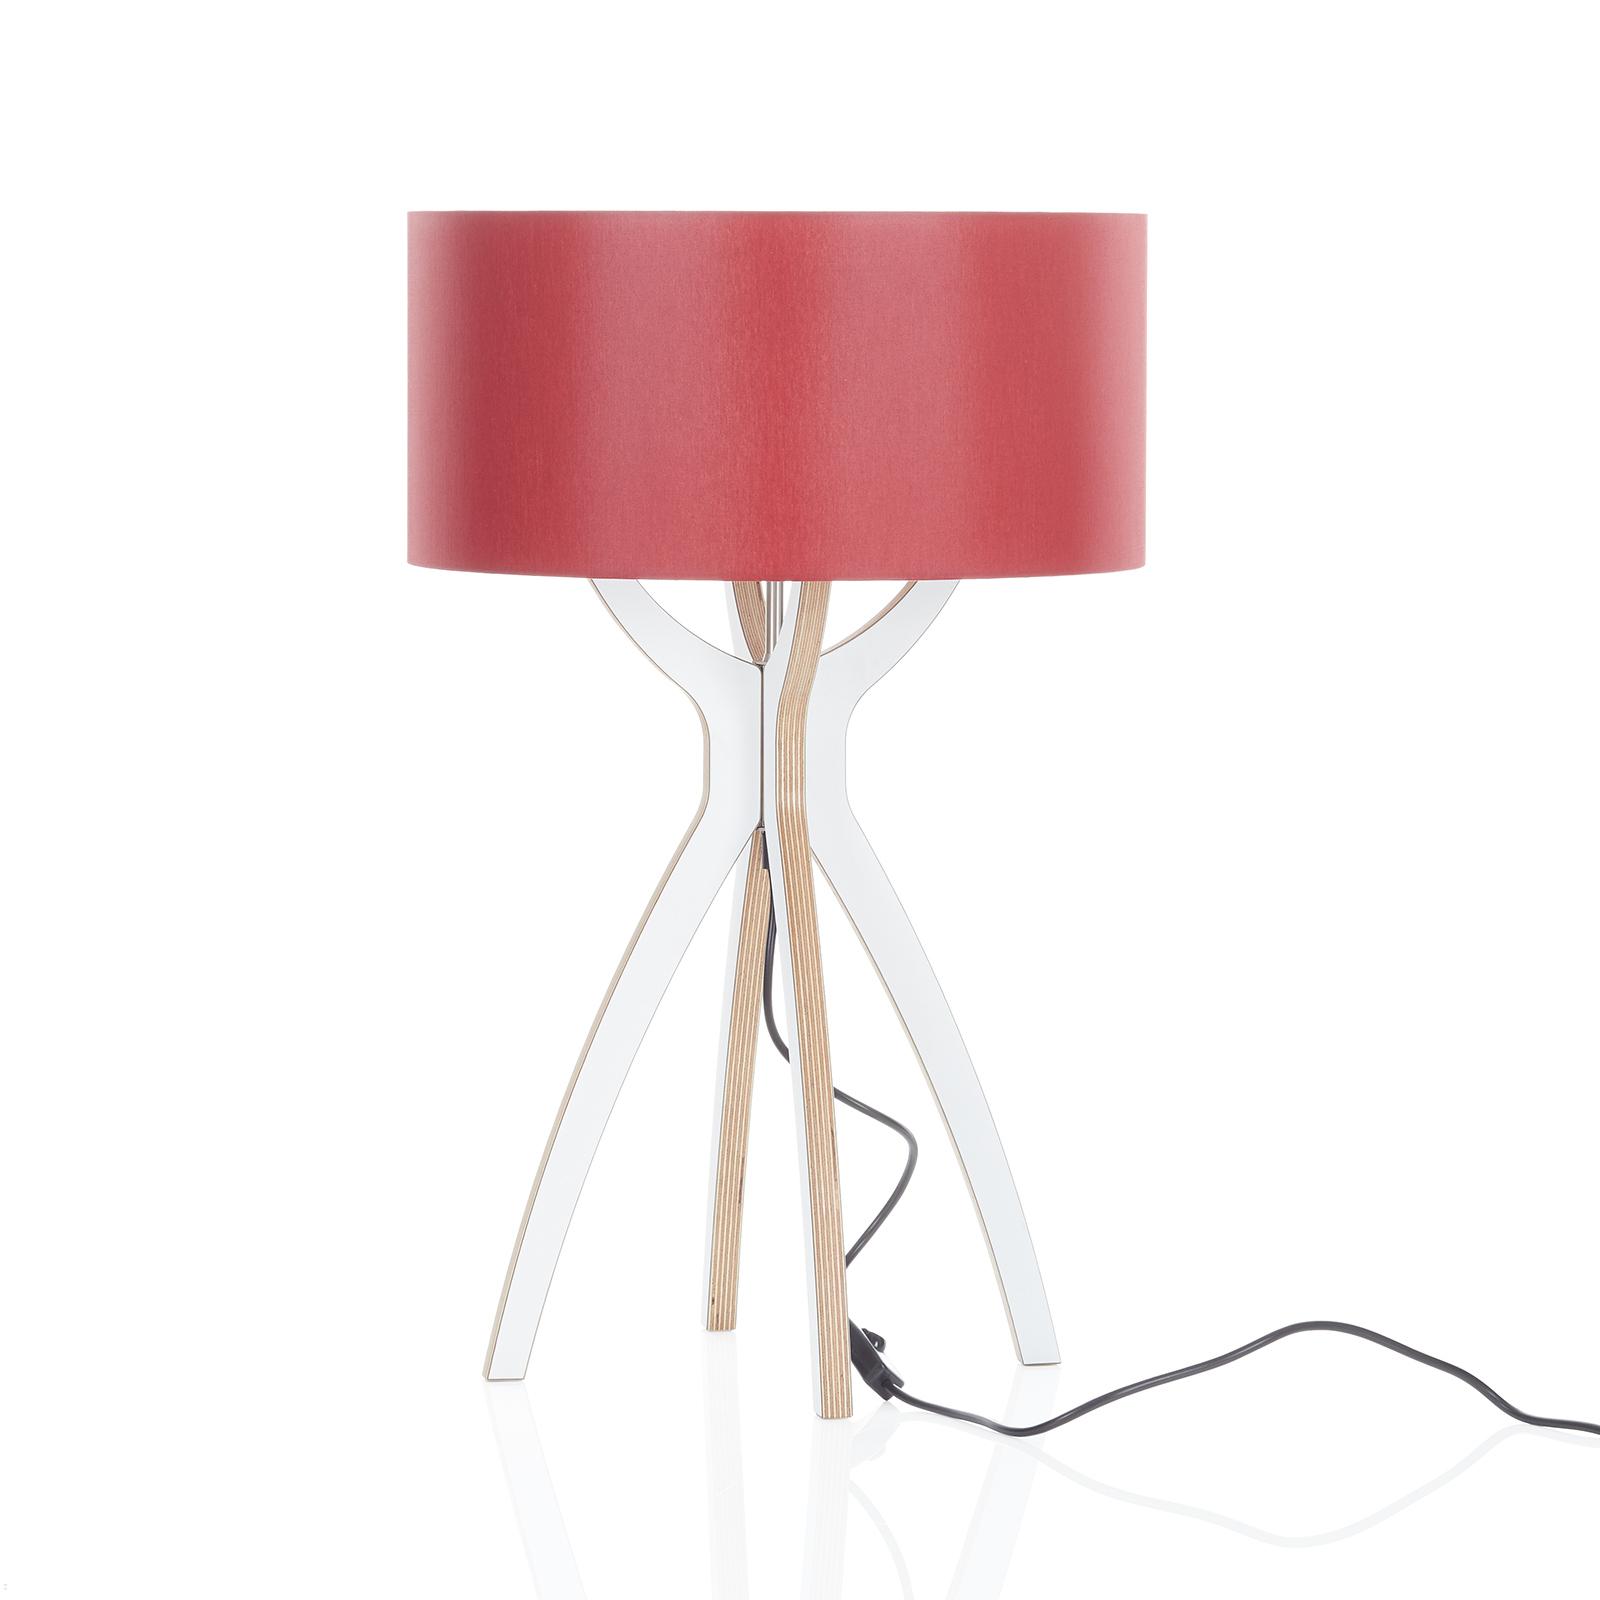 B-Leuchten Body bordlampe, træ, rød